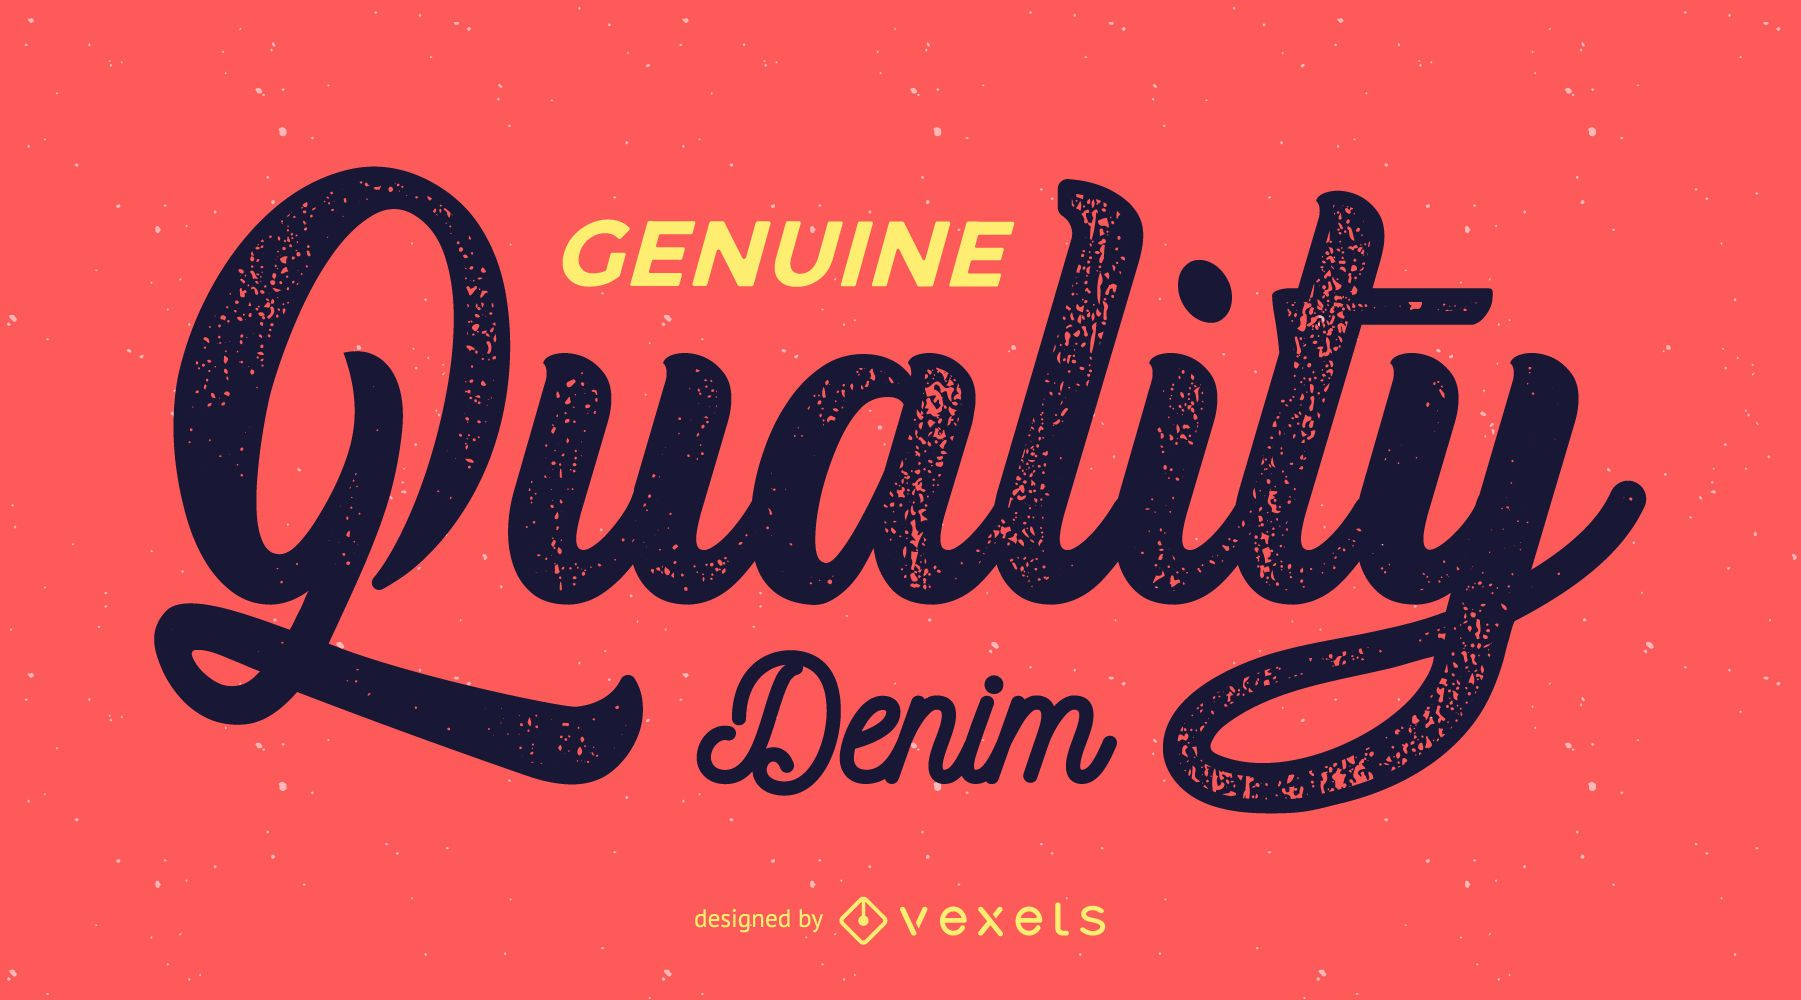 Etiqueta retro de calidad genuina